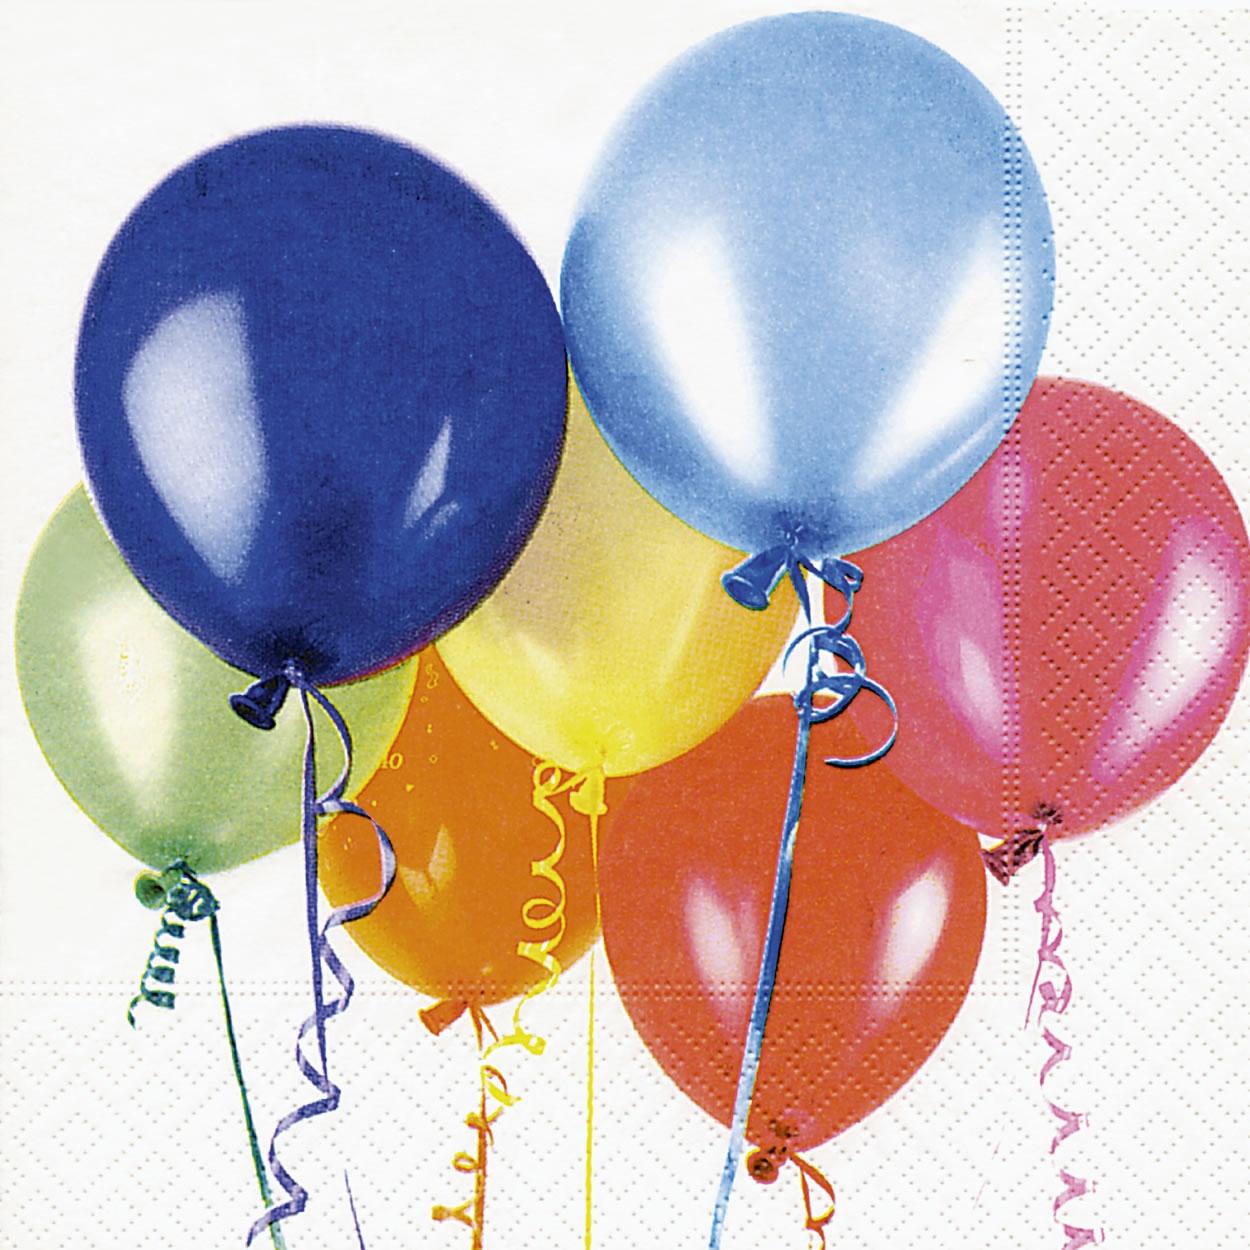 Lunch Servietten flying balloons,  Motive - Luftballon,  Everyday,  lunchservietten,  Luftballon